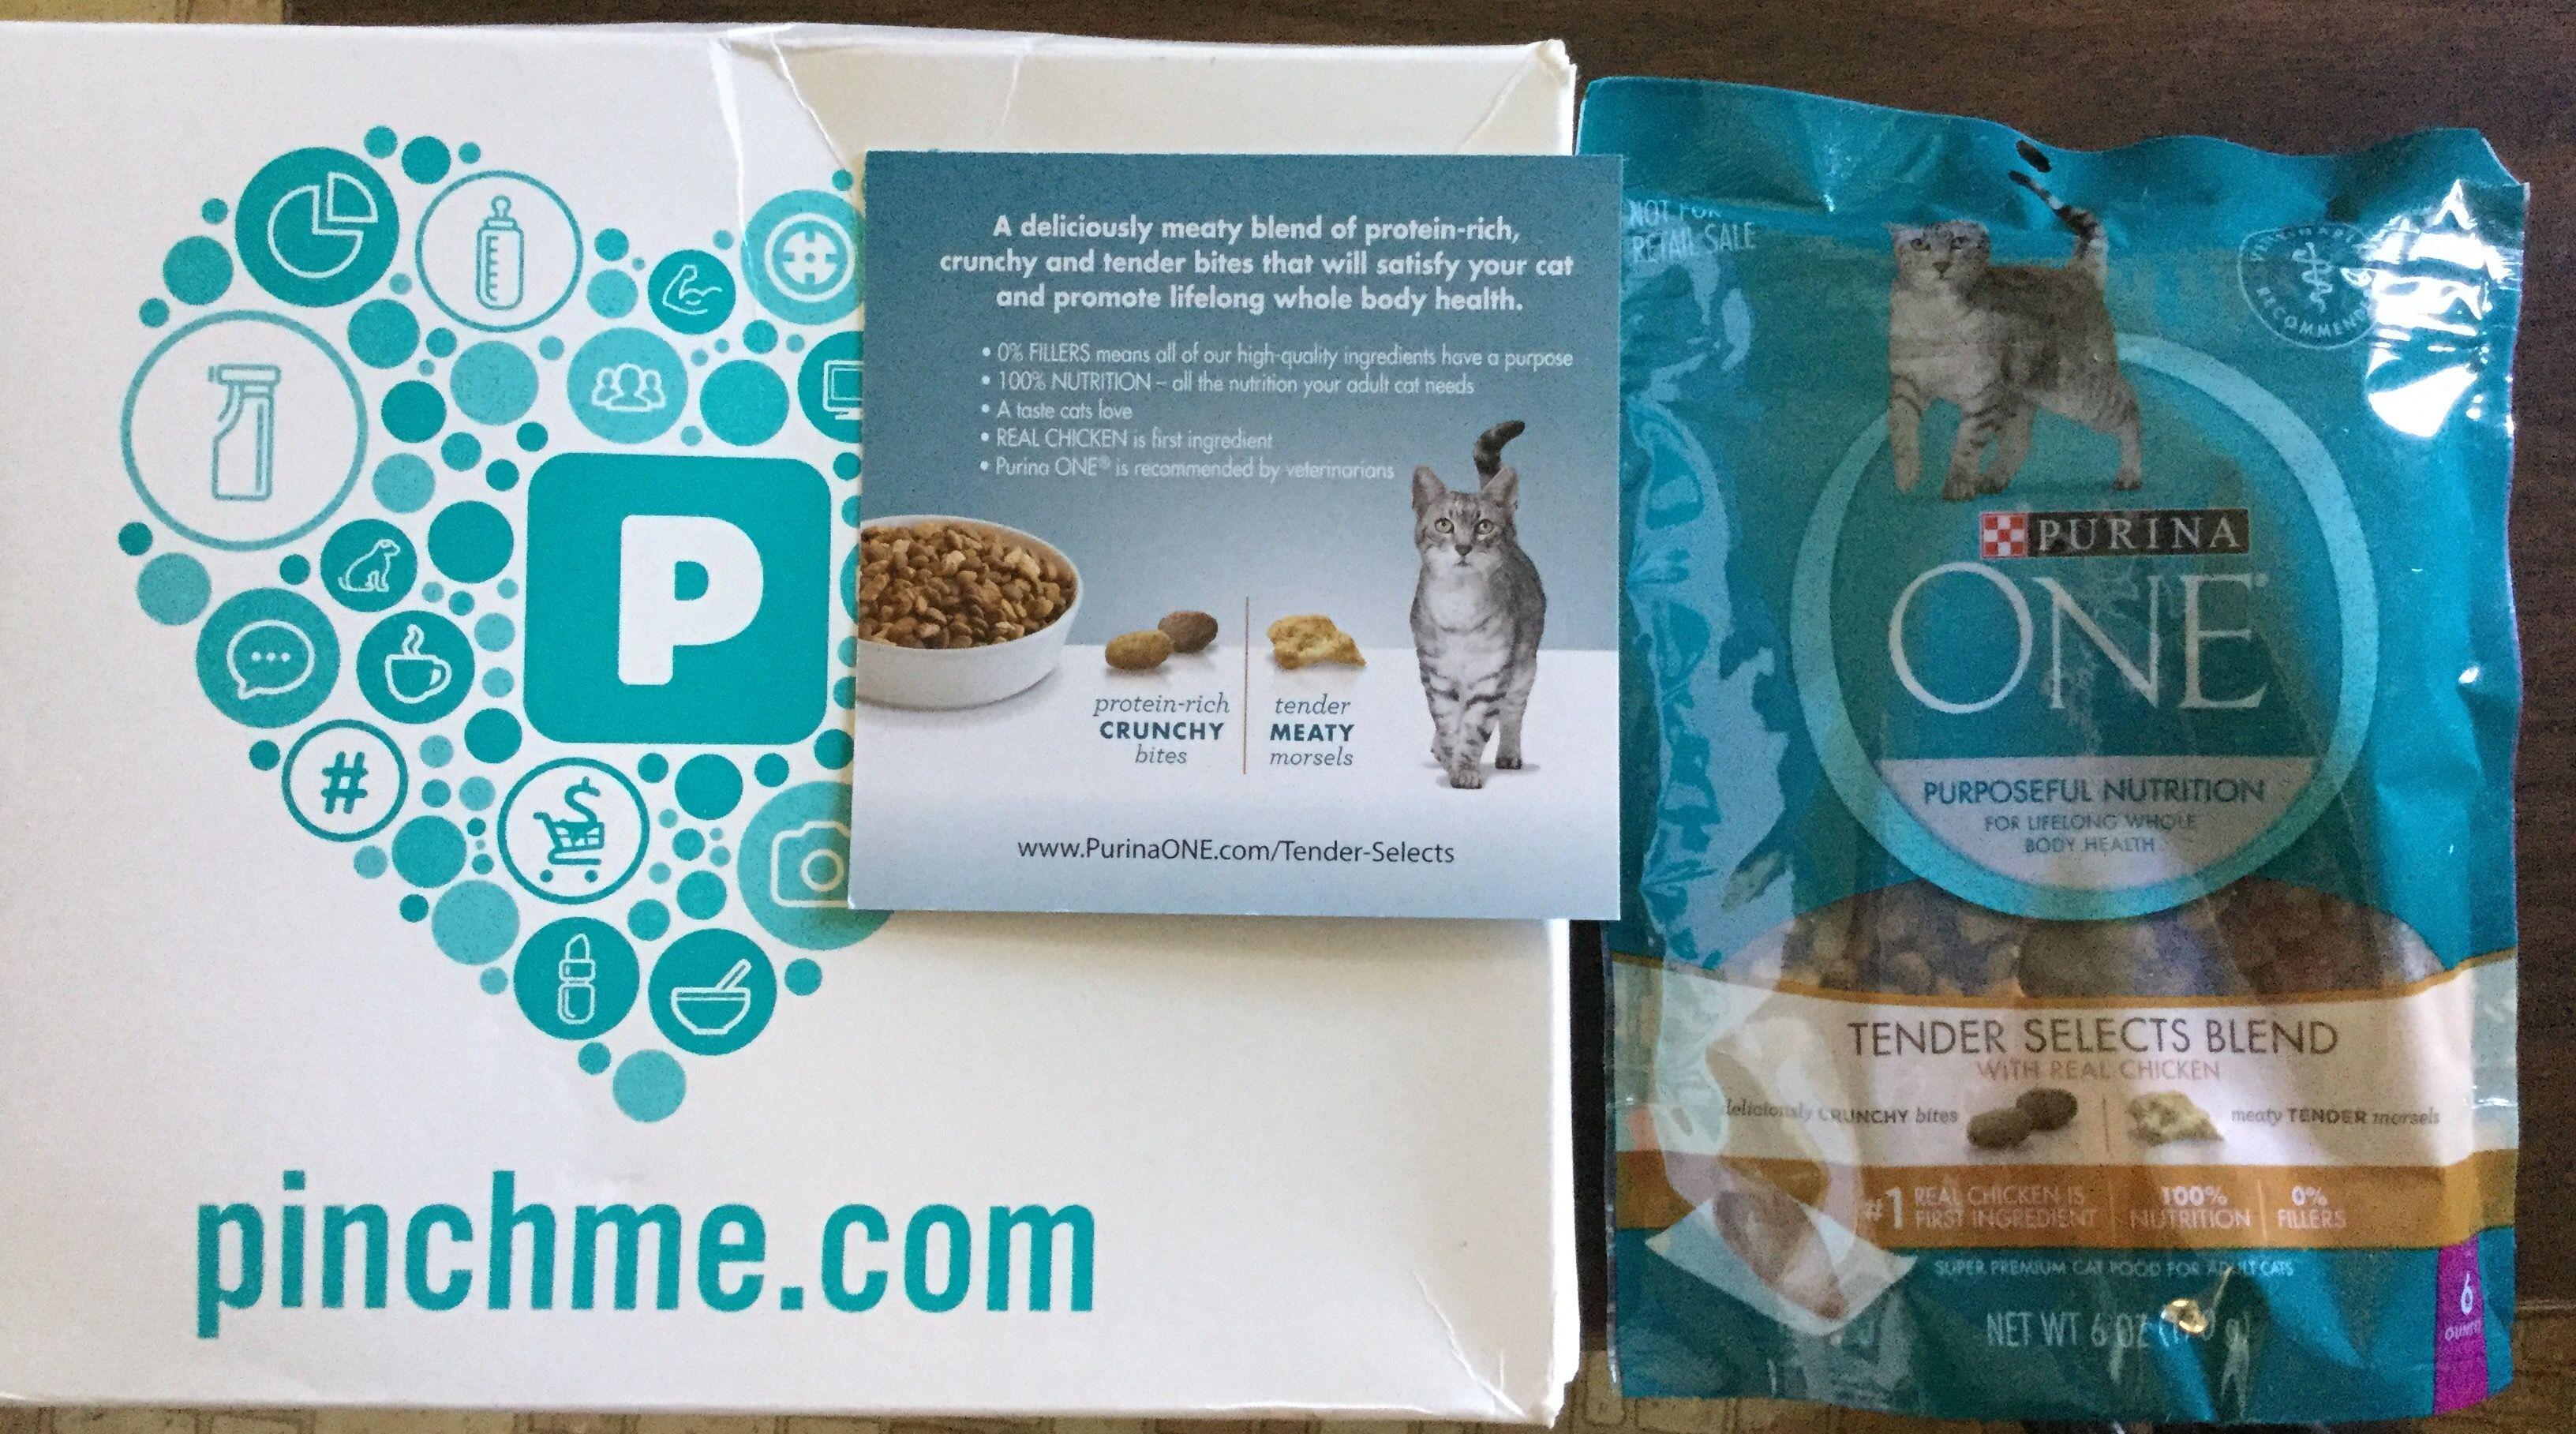 Free Purina One cat food  sample and coupon #freestuff #freebies #samples #free